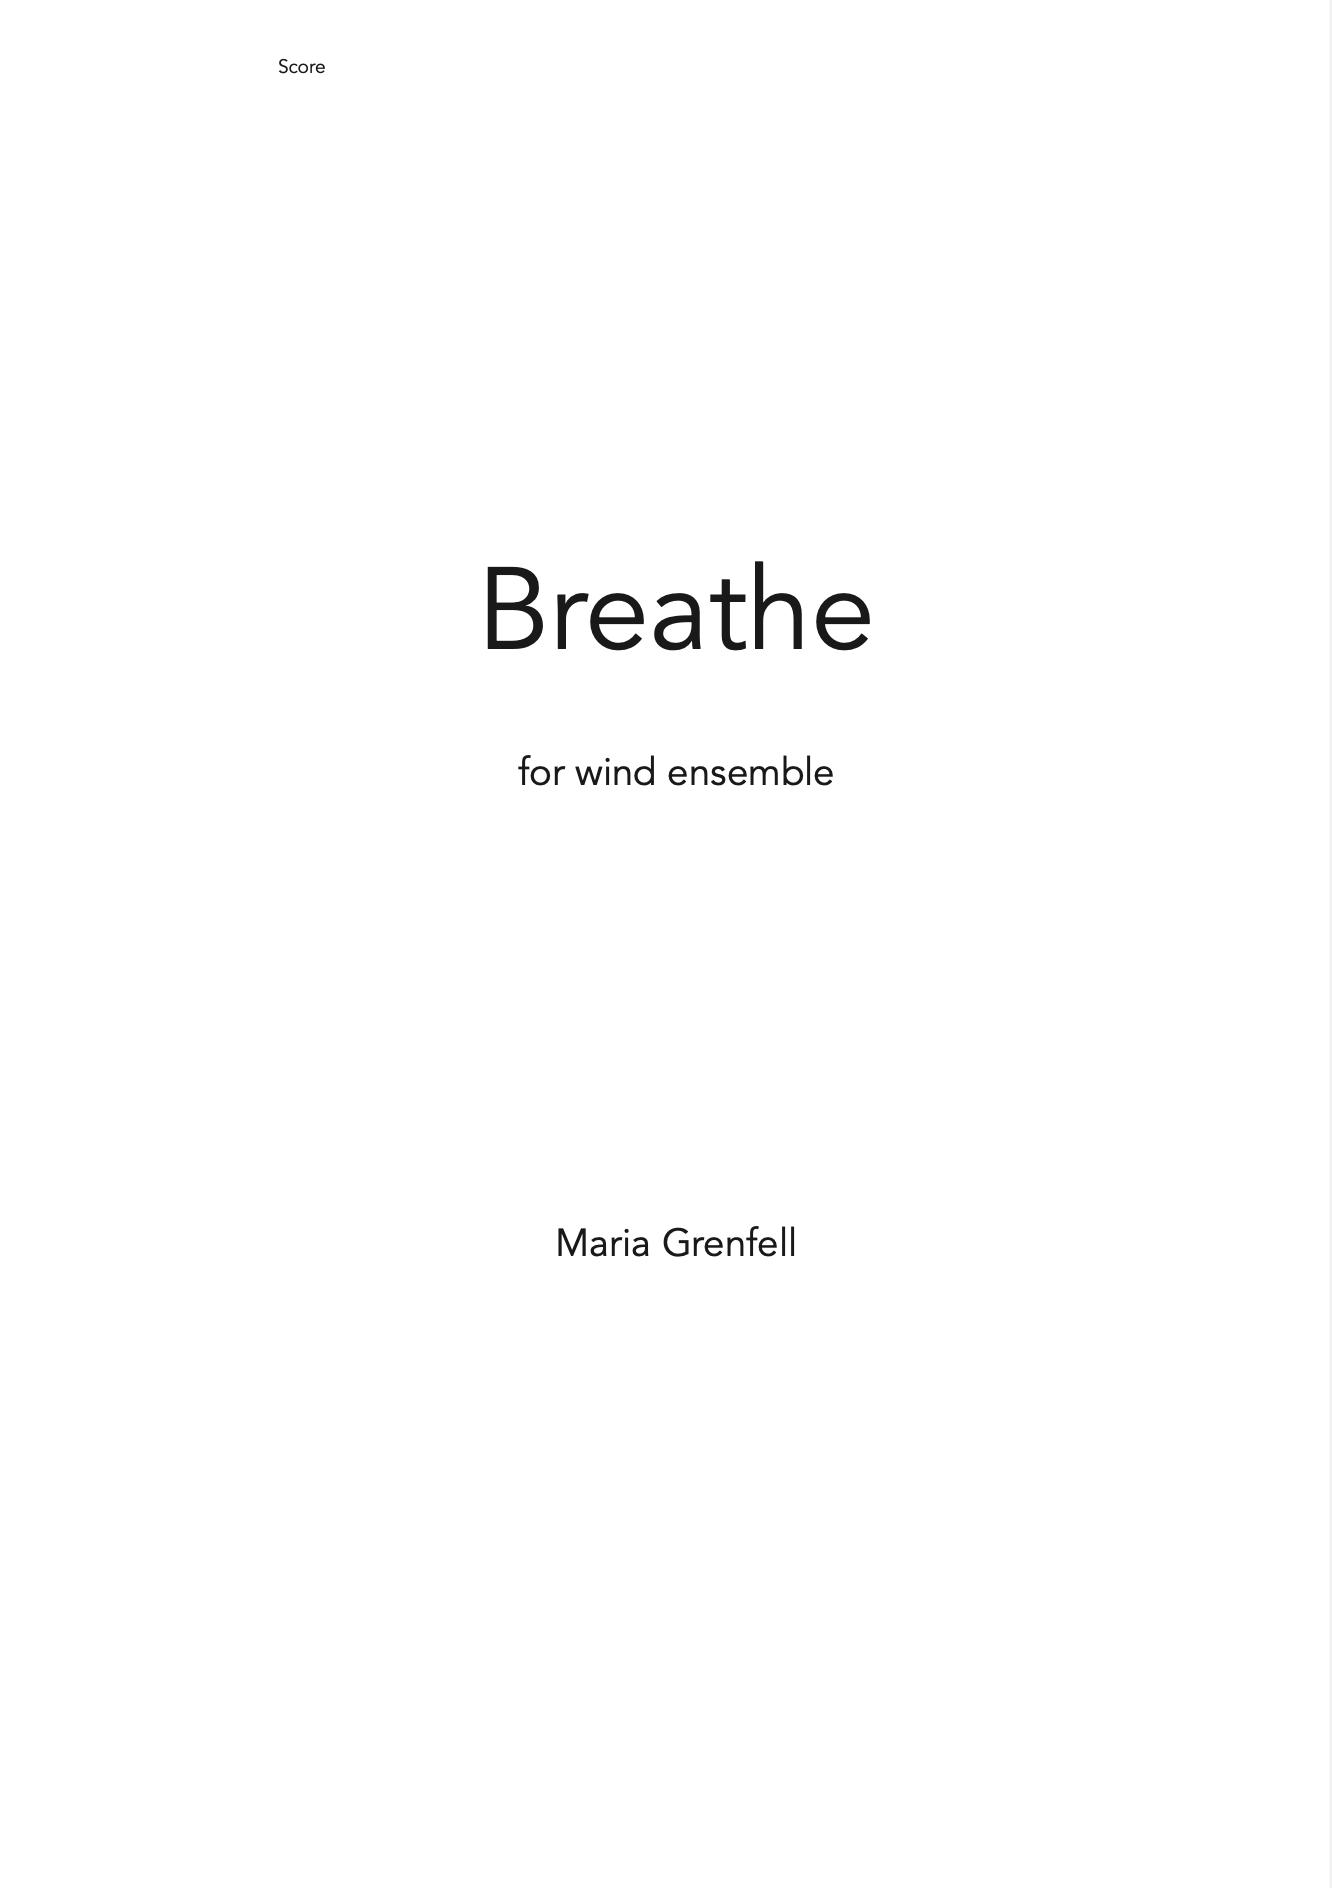 Breathe by Evan Williams